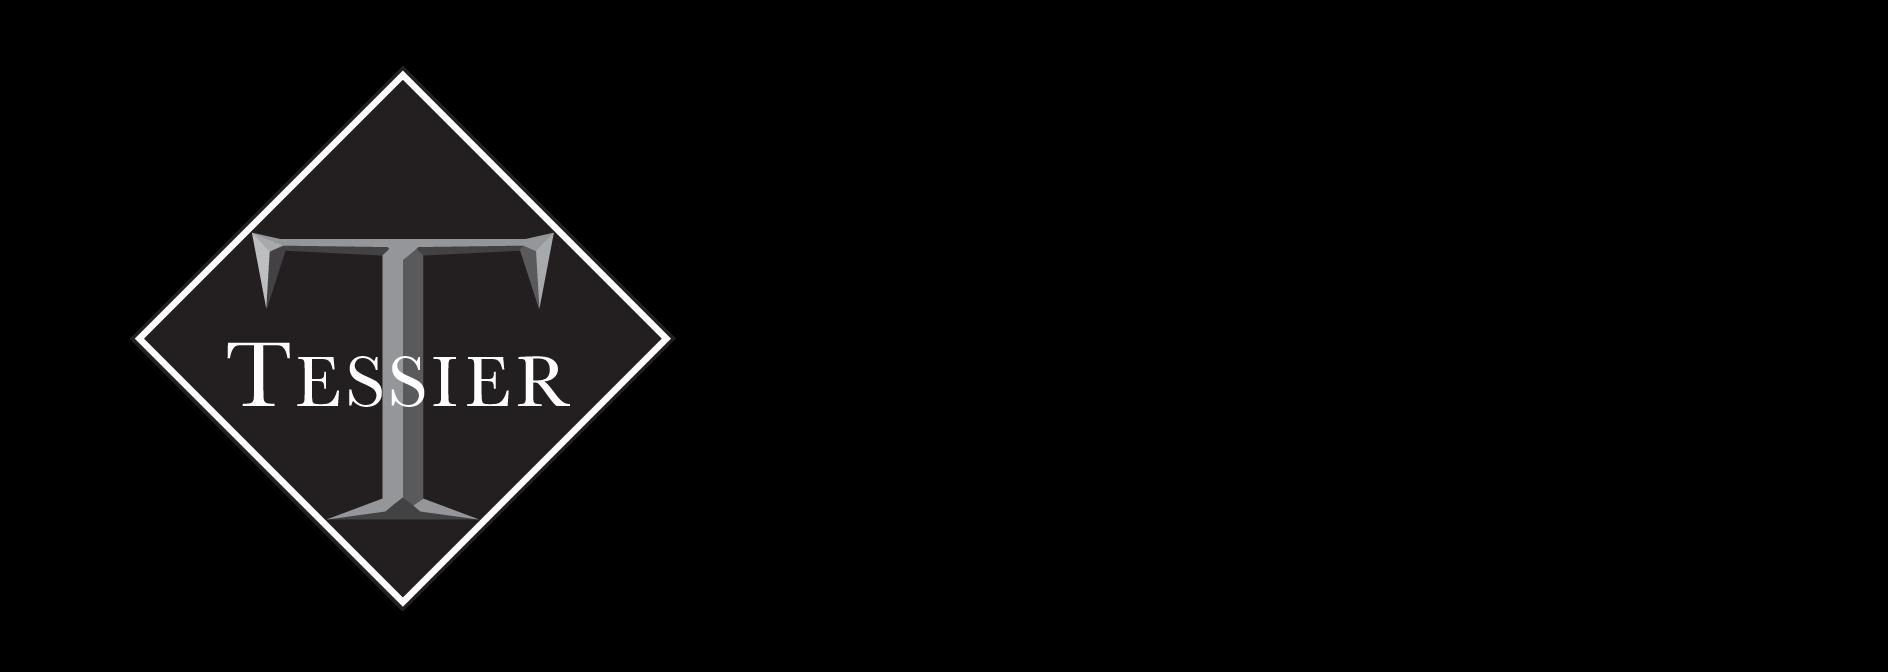 Lee Tessier Team logo